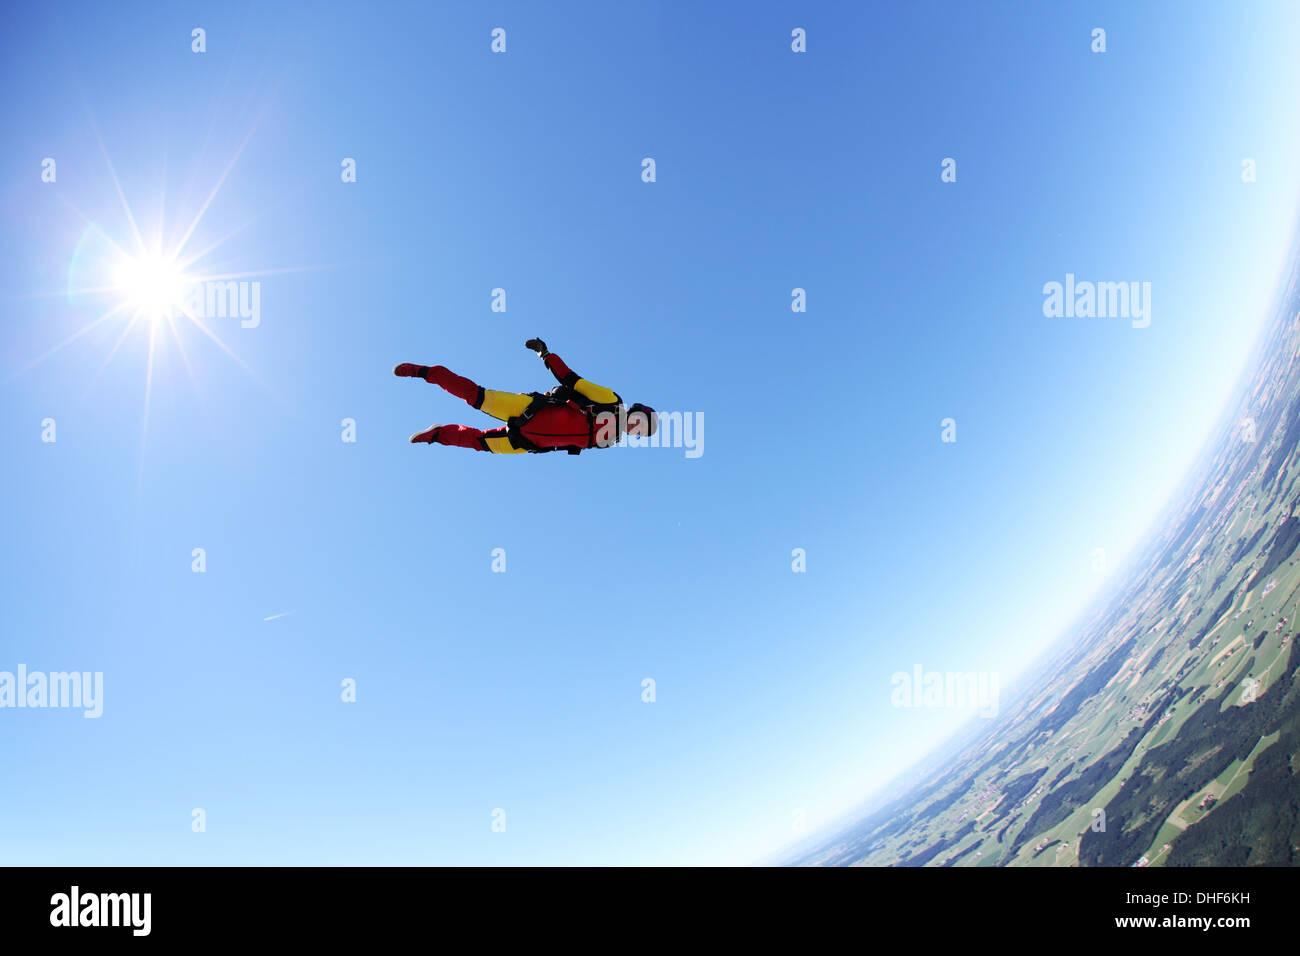 Fallschirmspringer frei fallenden verdeckt über Leutkirch, Bayern, Deutschland Stockbild